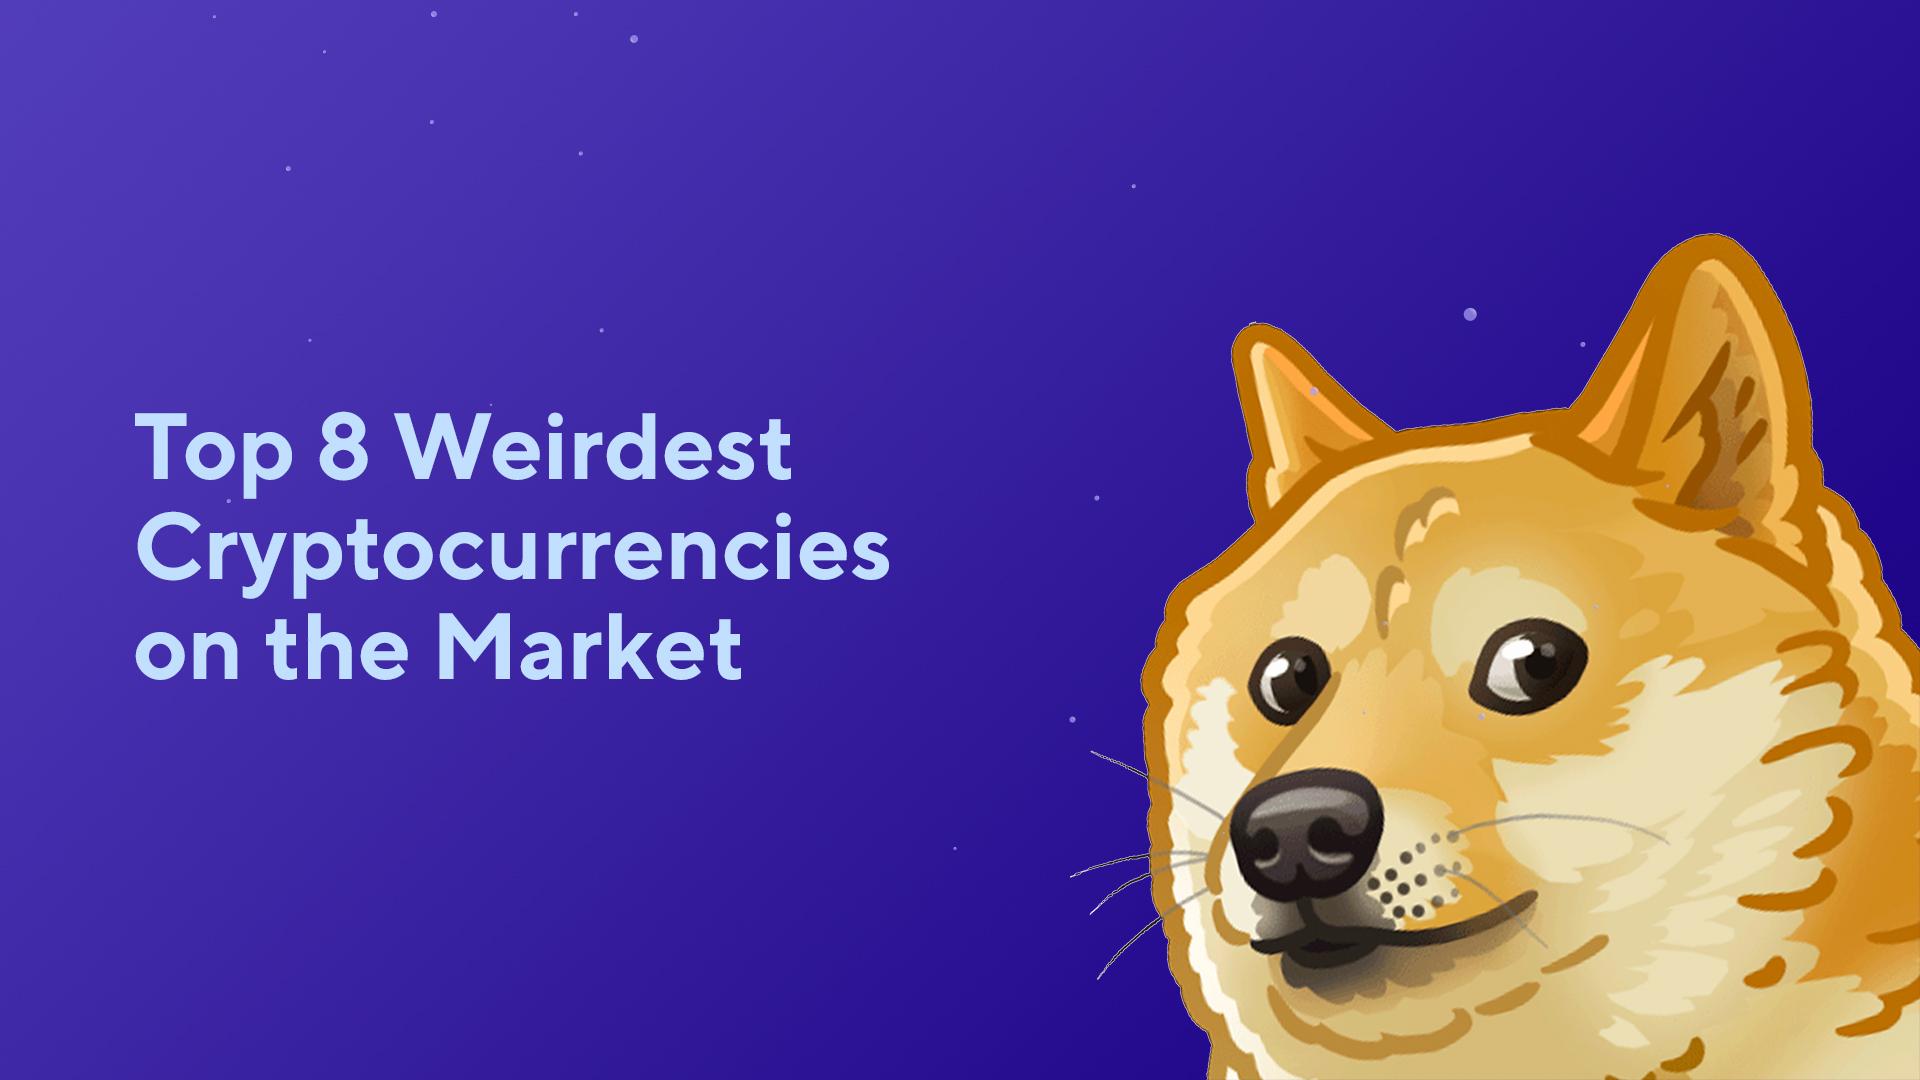 Top 8 Weirdest Cryptocurrencies on the Market